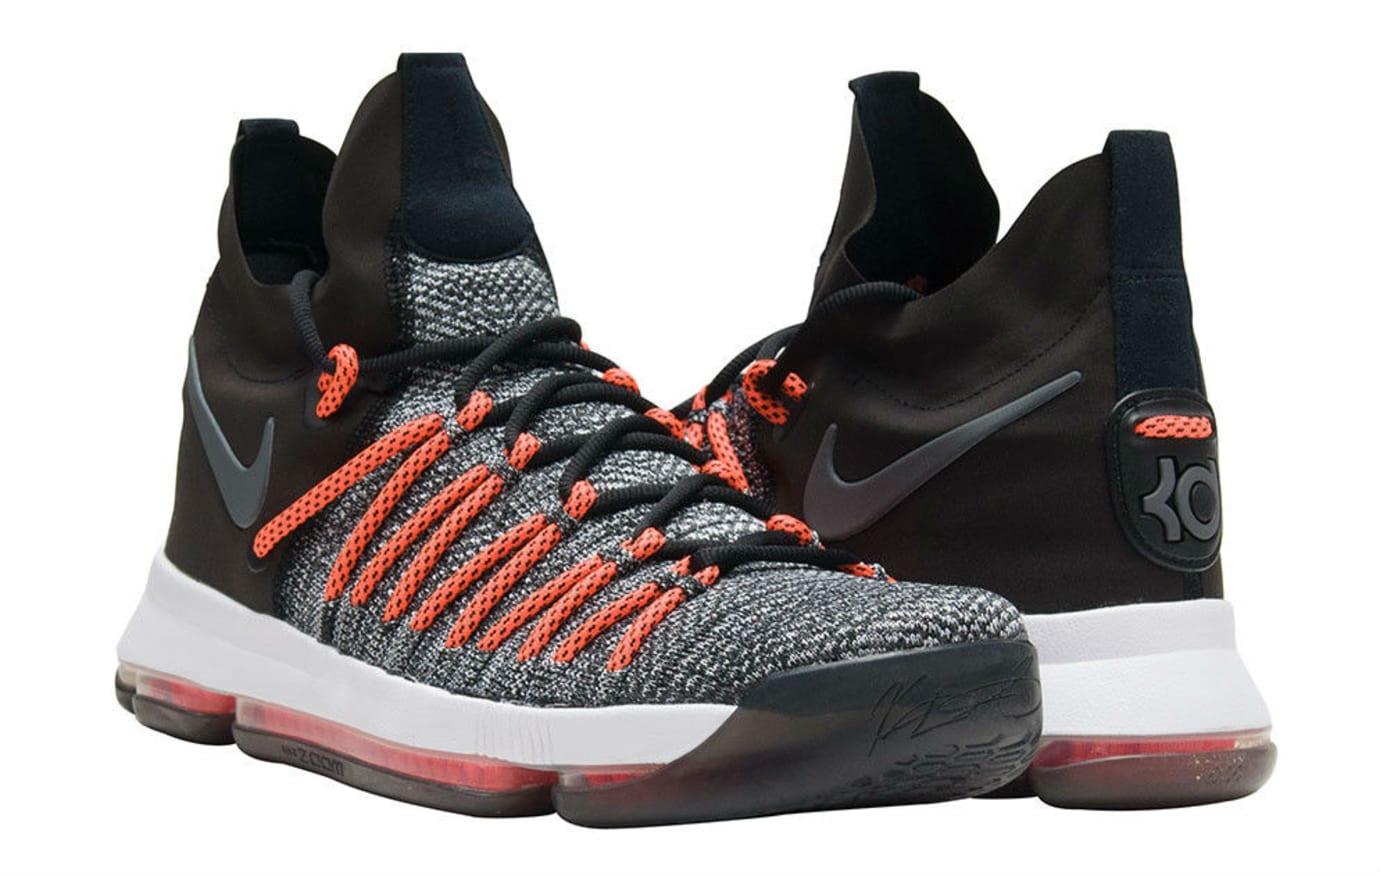 Nike KD 9 Elite Black White Dark Grey Hyper Orange Release Date Front 878637-010